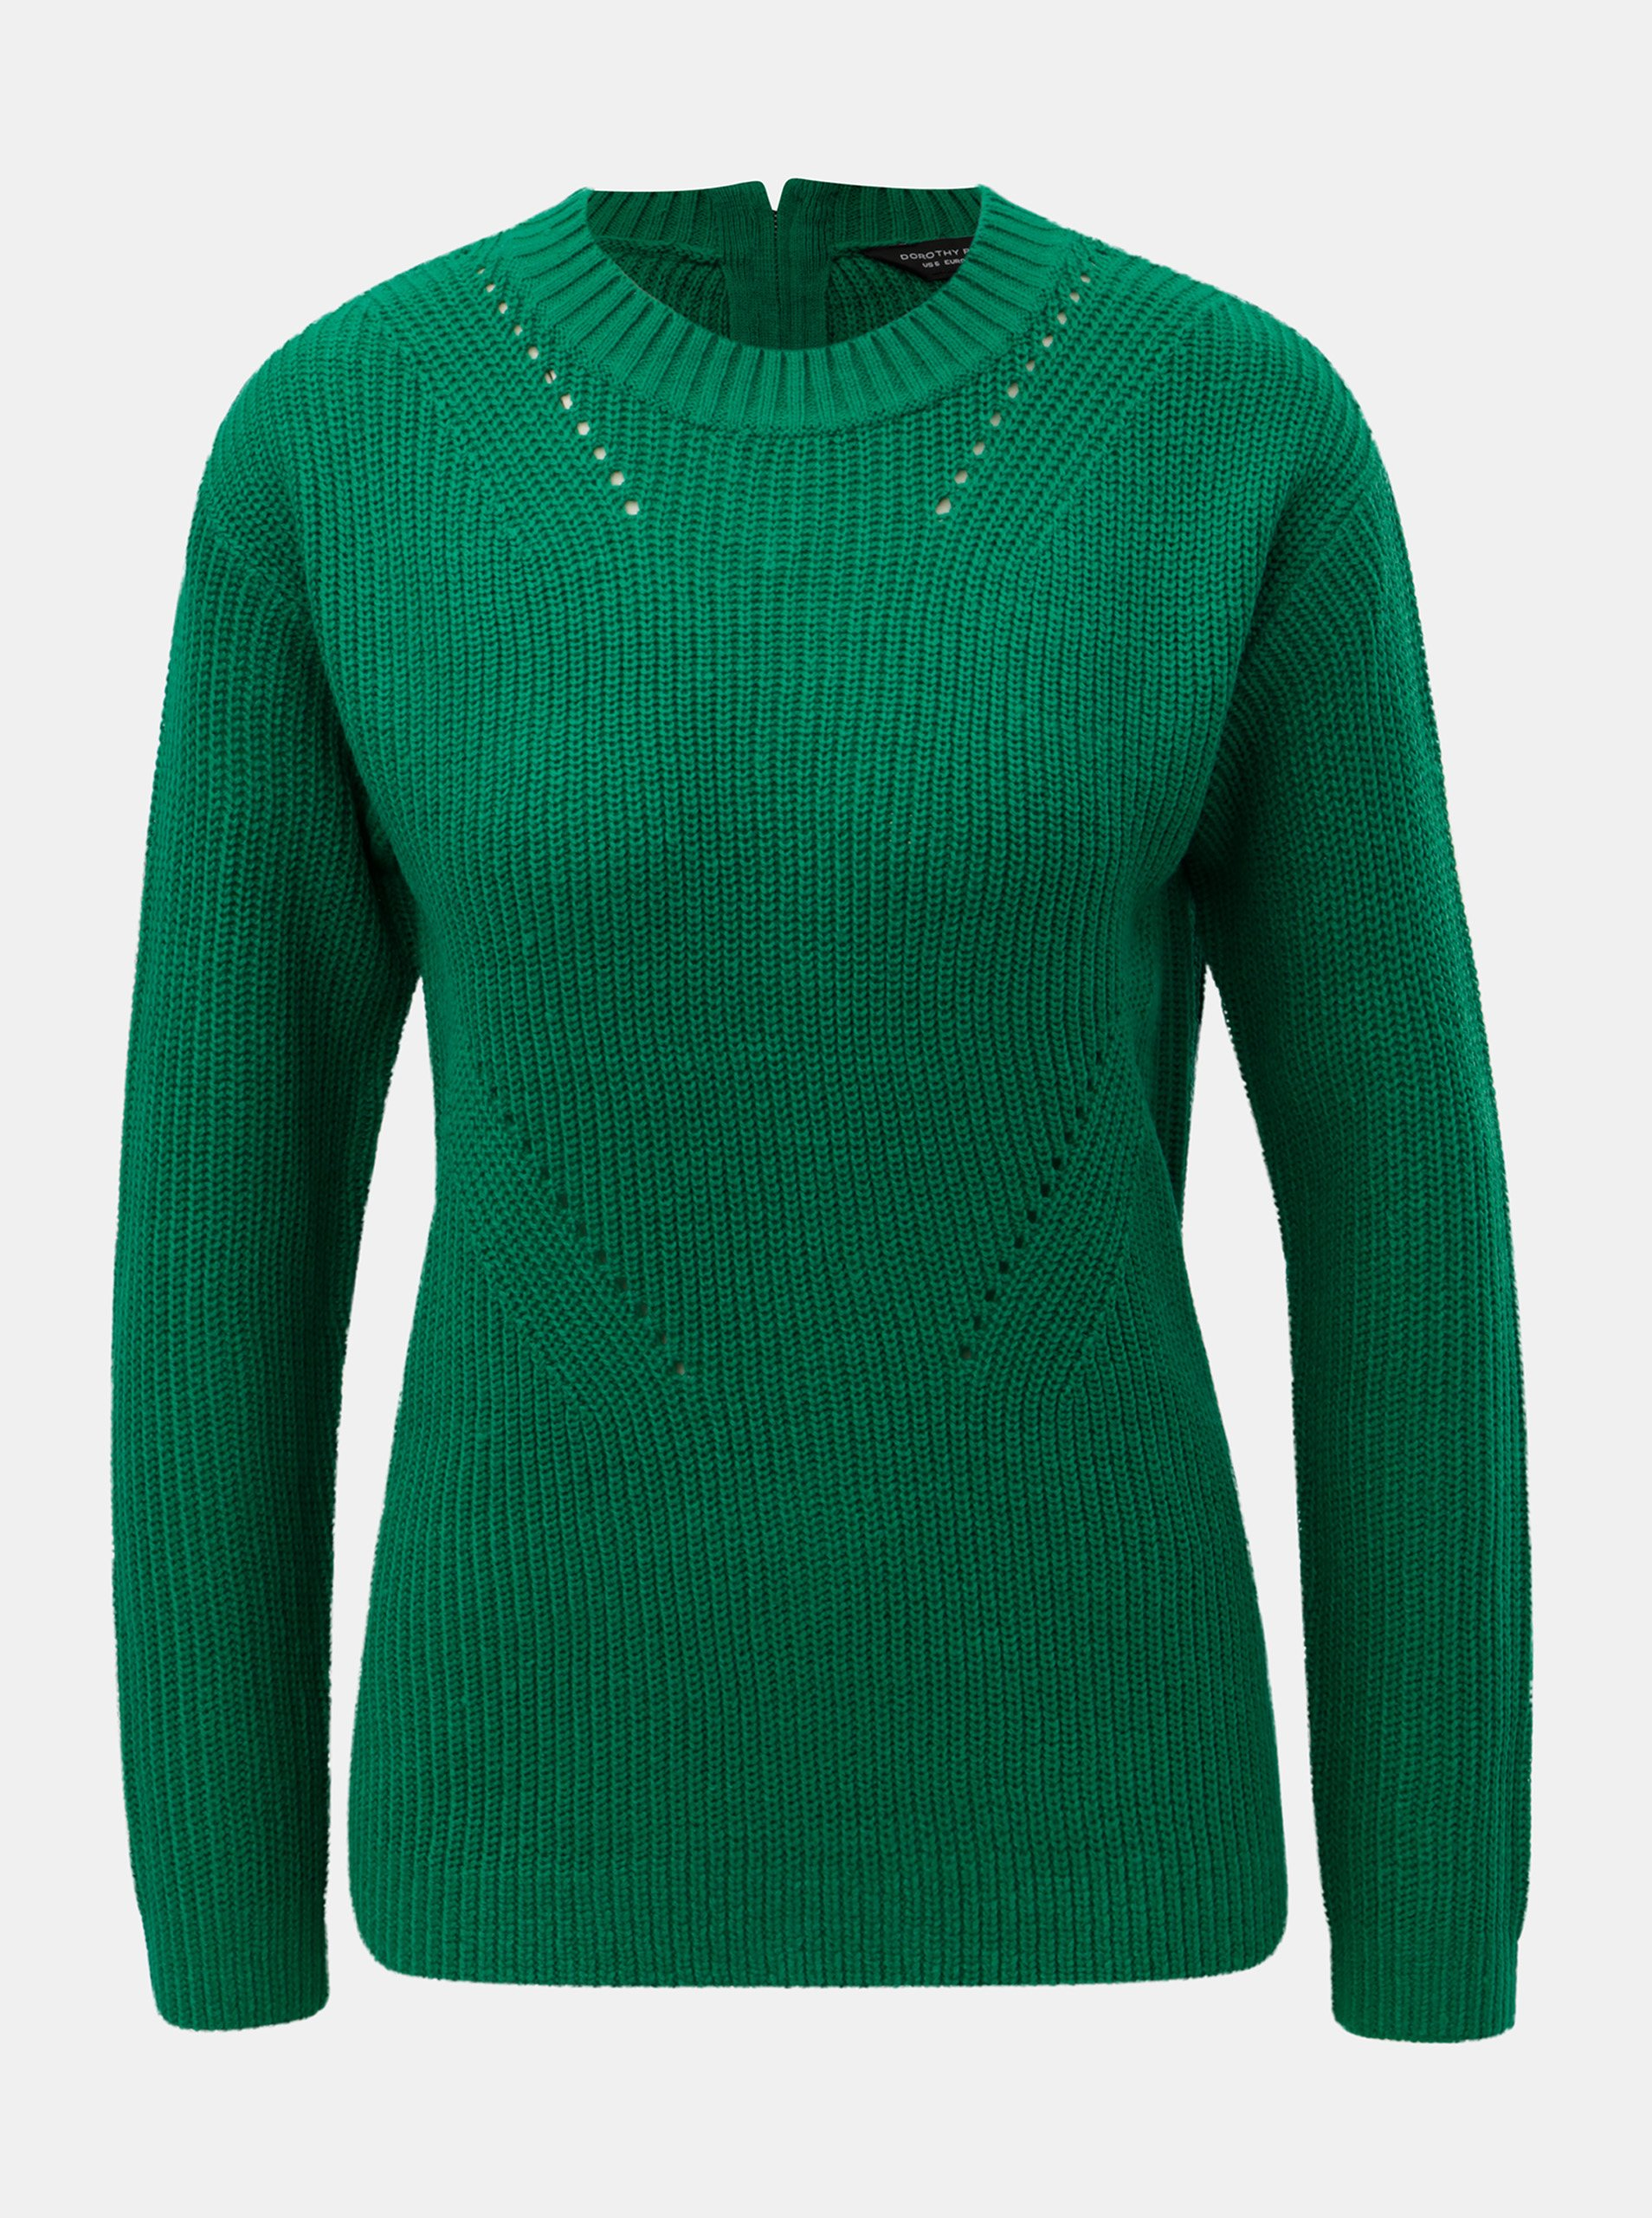 896101f6fdc2 Zelený svetr se zipem na zádech Dorothy Perkins